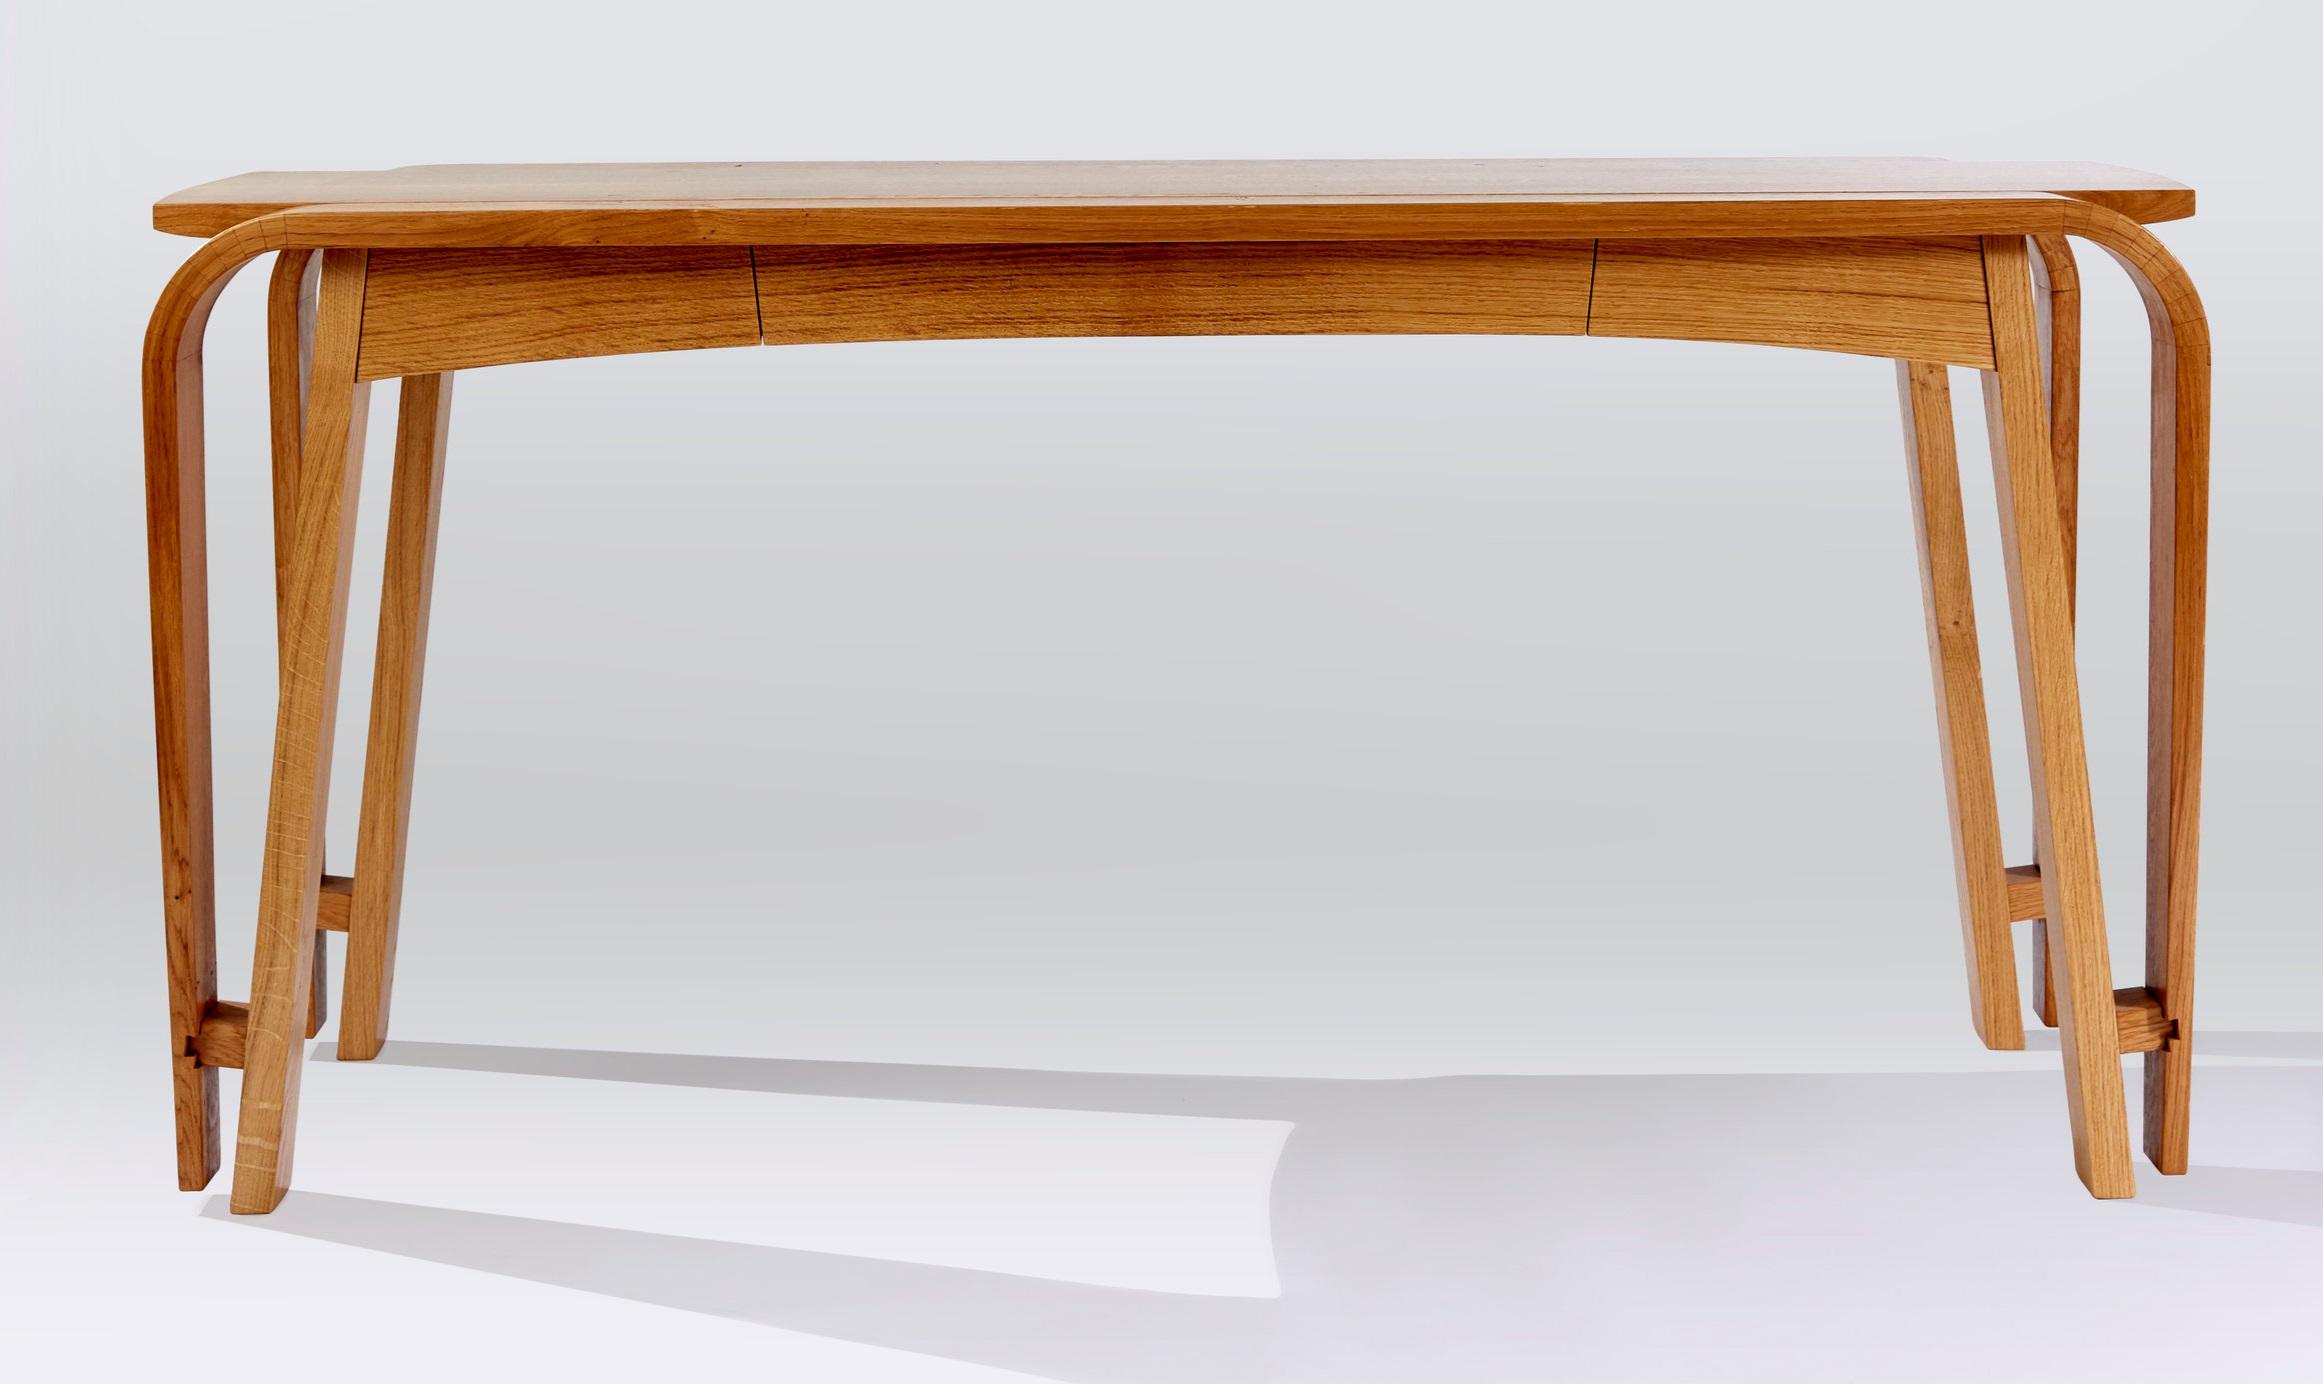 Desk8_1_Flat1.jpg